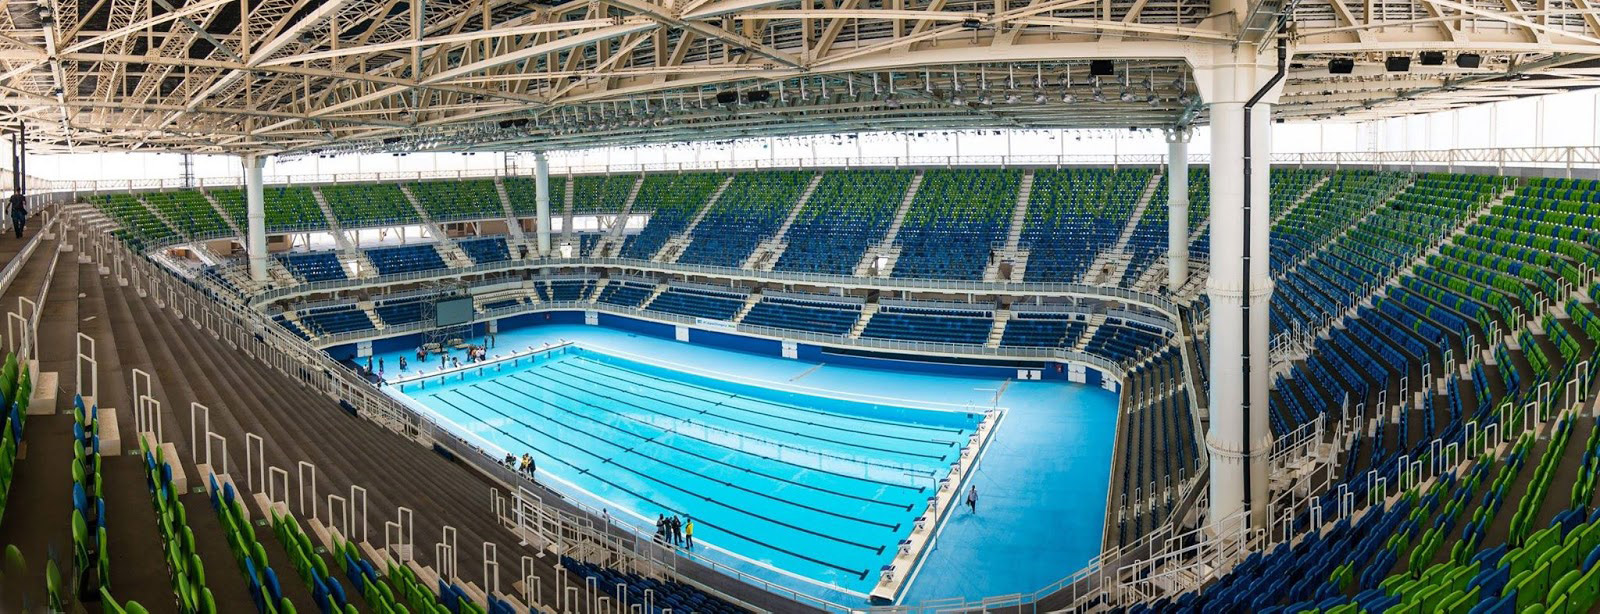 vareajao olympic swimming pool 2016